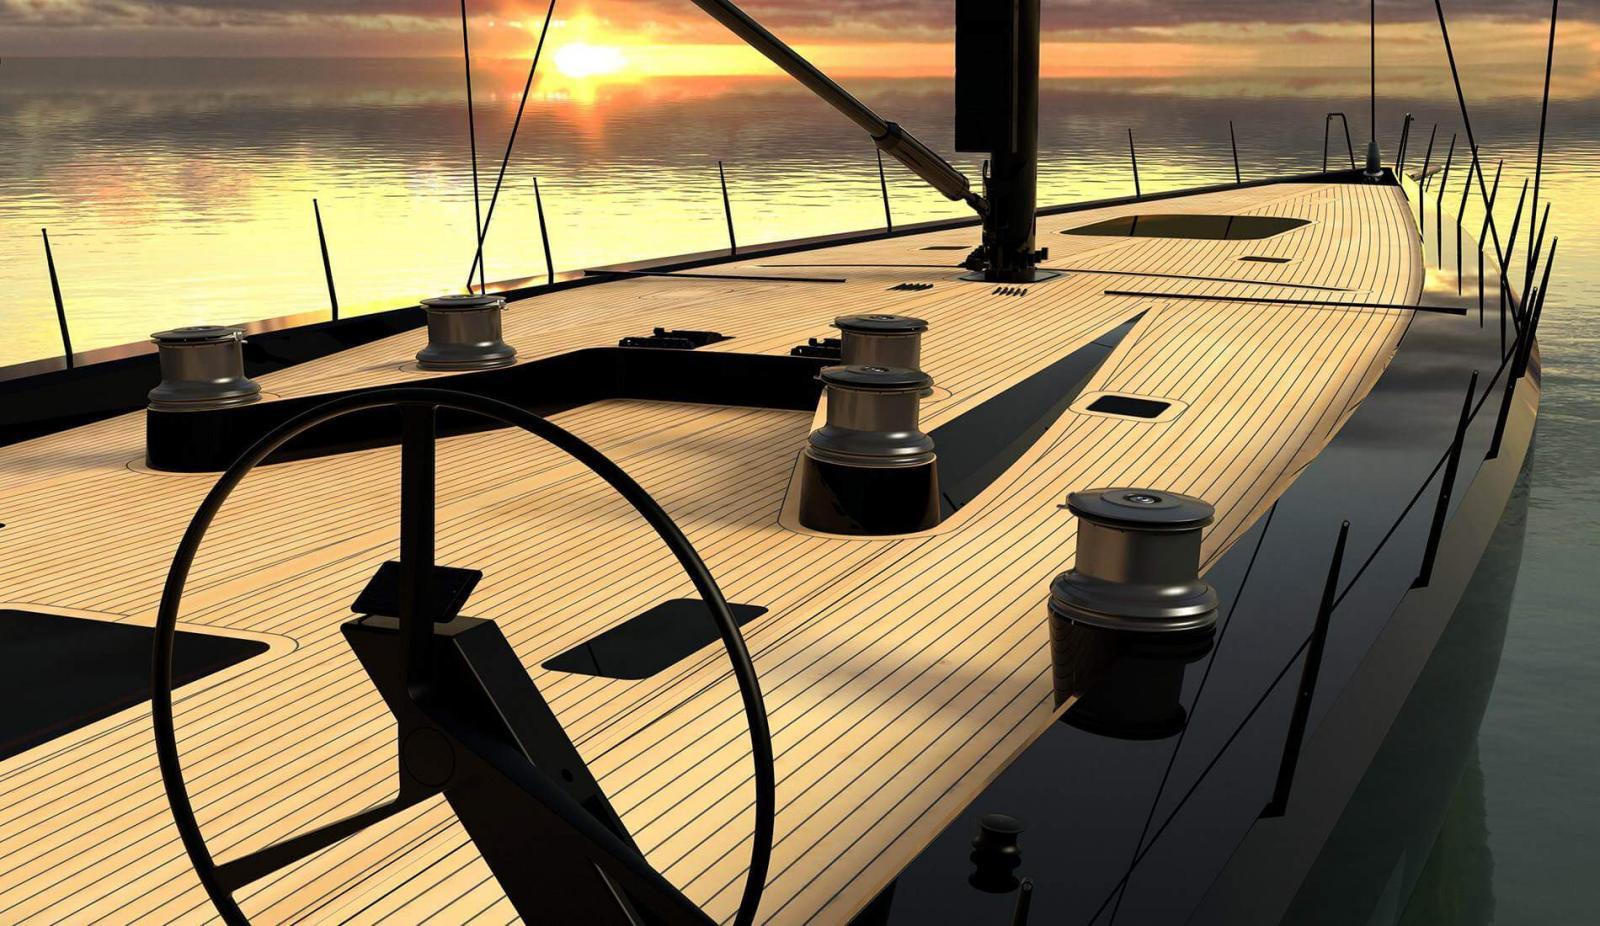 Wallycento Hull 4 Tango - Sailing Yacht